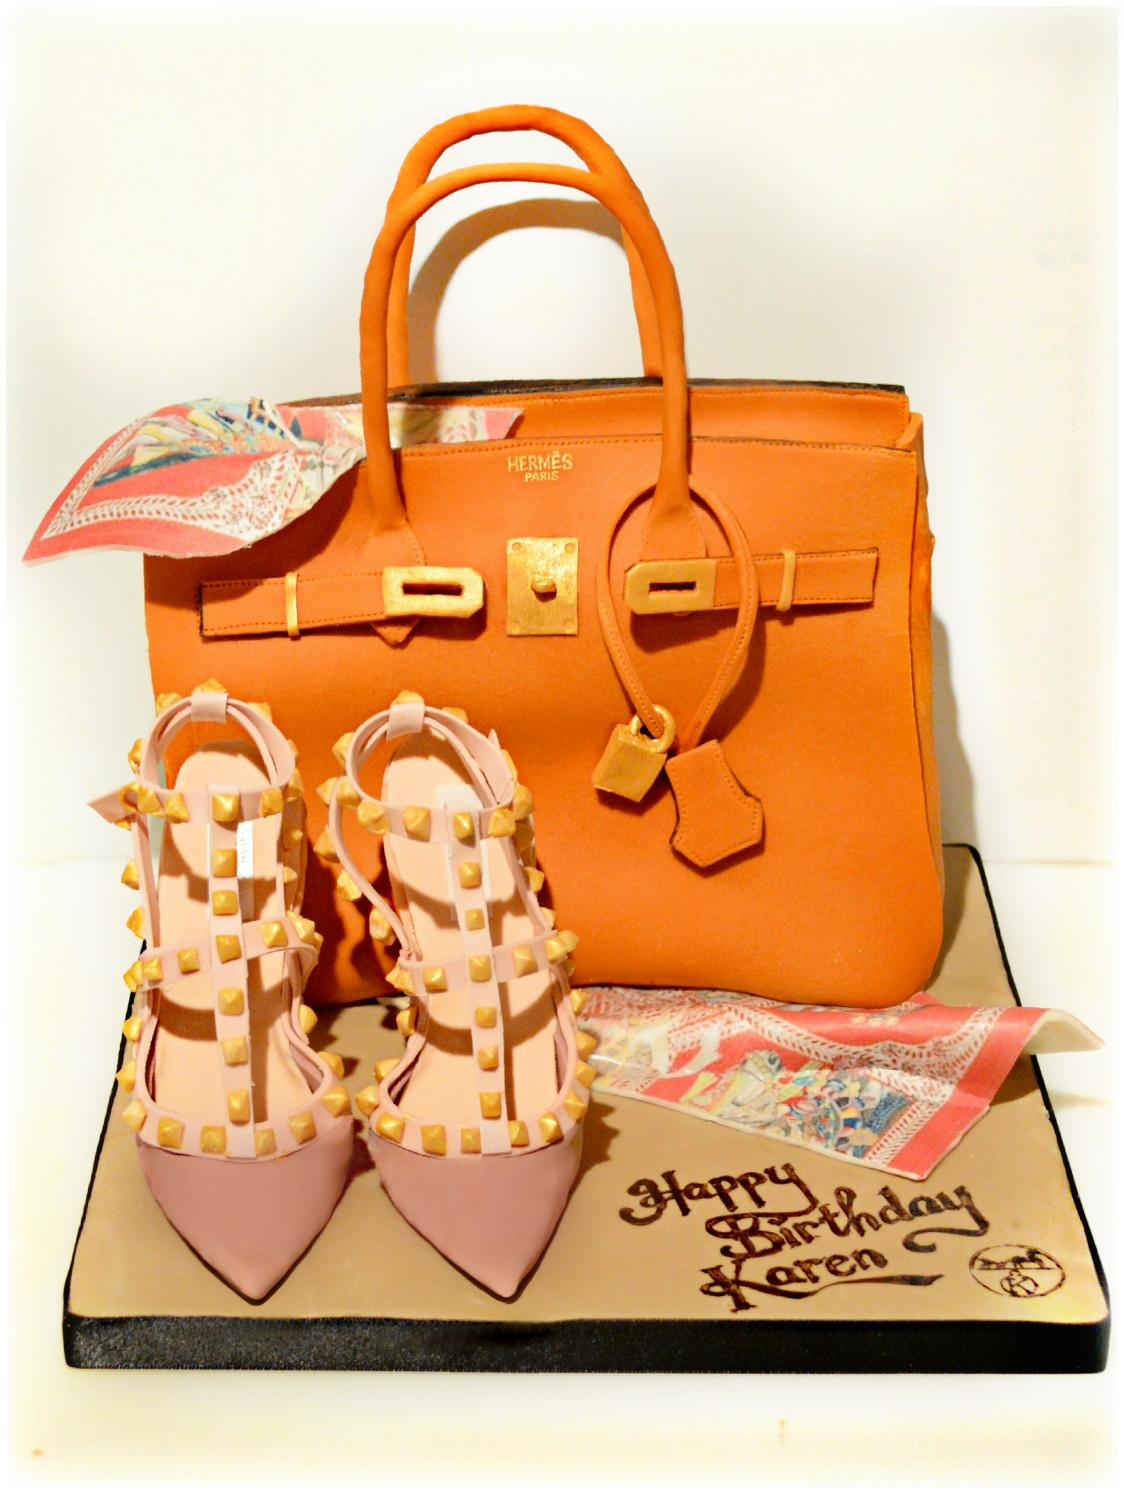 Hermes Orange Birkin Handbag Birthday Cake with Scarf and Valentino Rockstud Pumps High Heel Shoes  Cherie Kelly Cake London